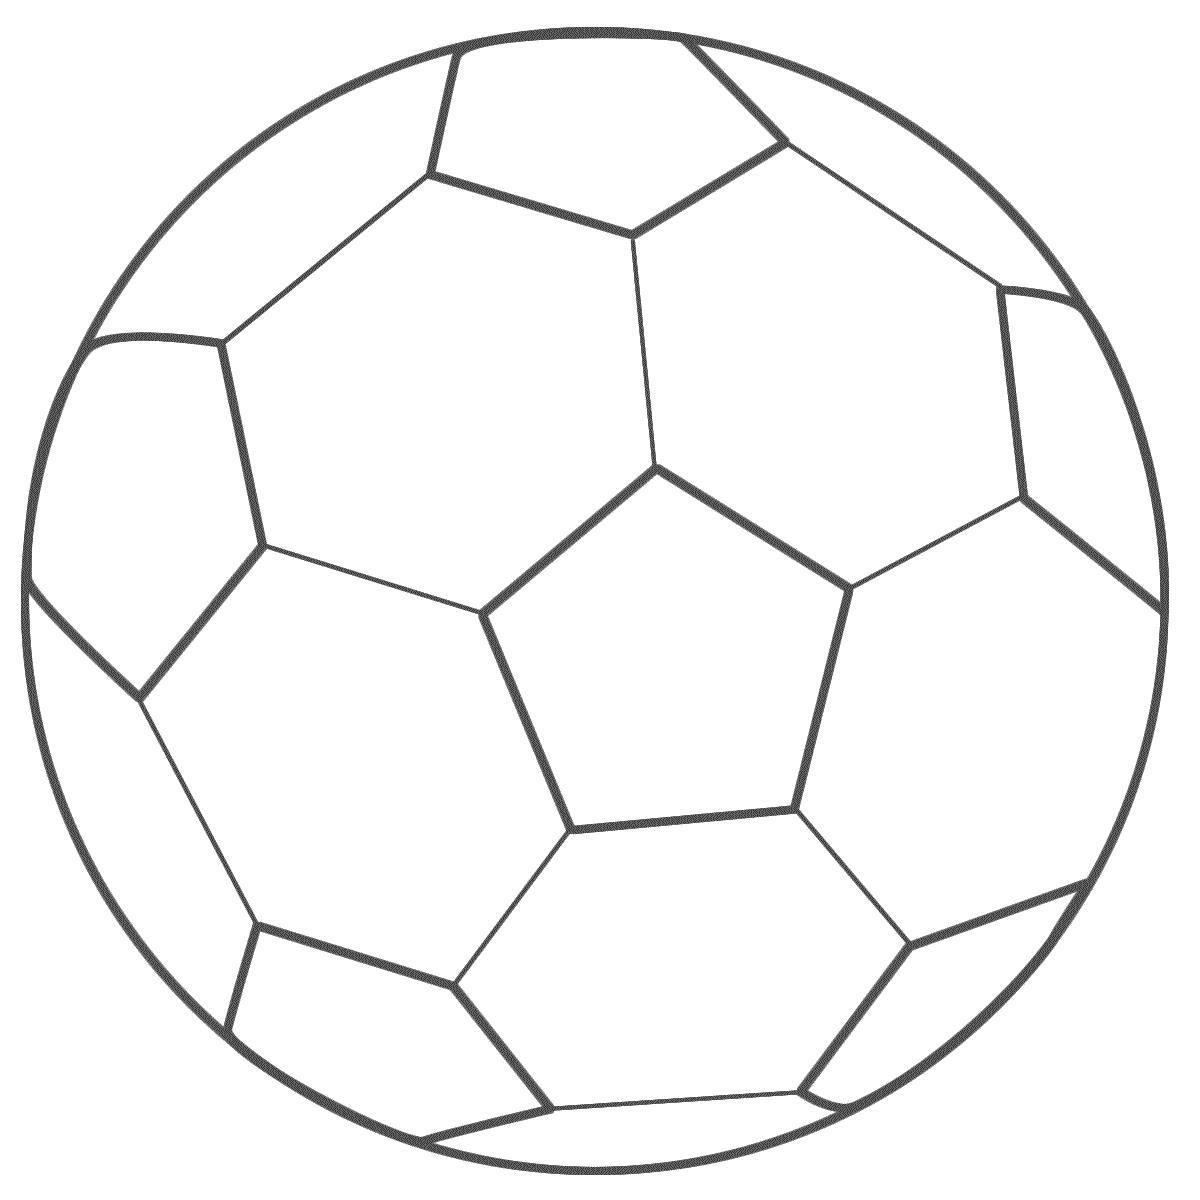 Http Colorings Co Soccerball Coloring Pages Futbol Para Colorear Dibujos De Balones Pelota De Futbol Dibujo